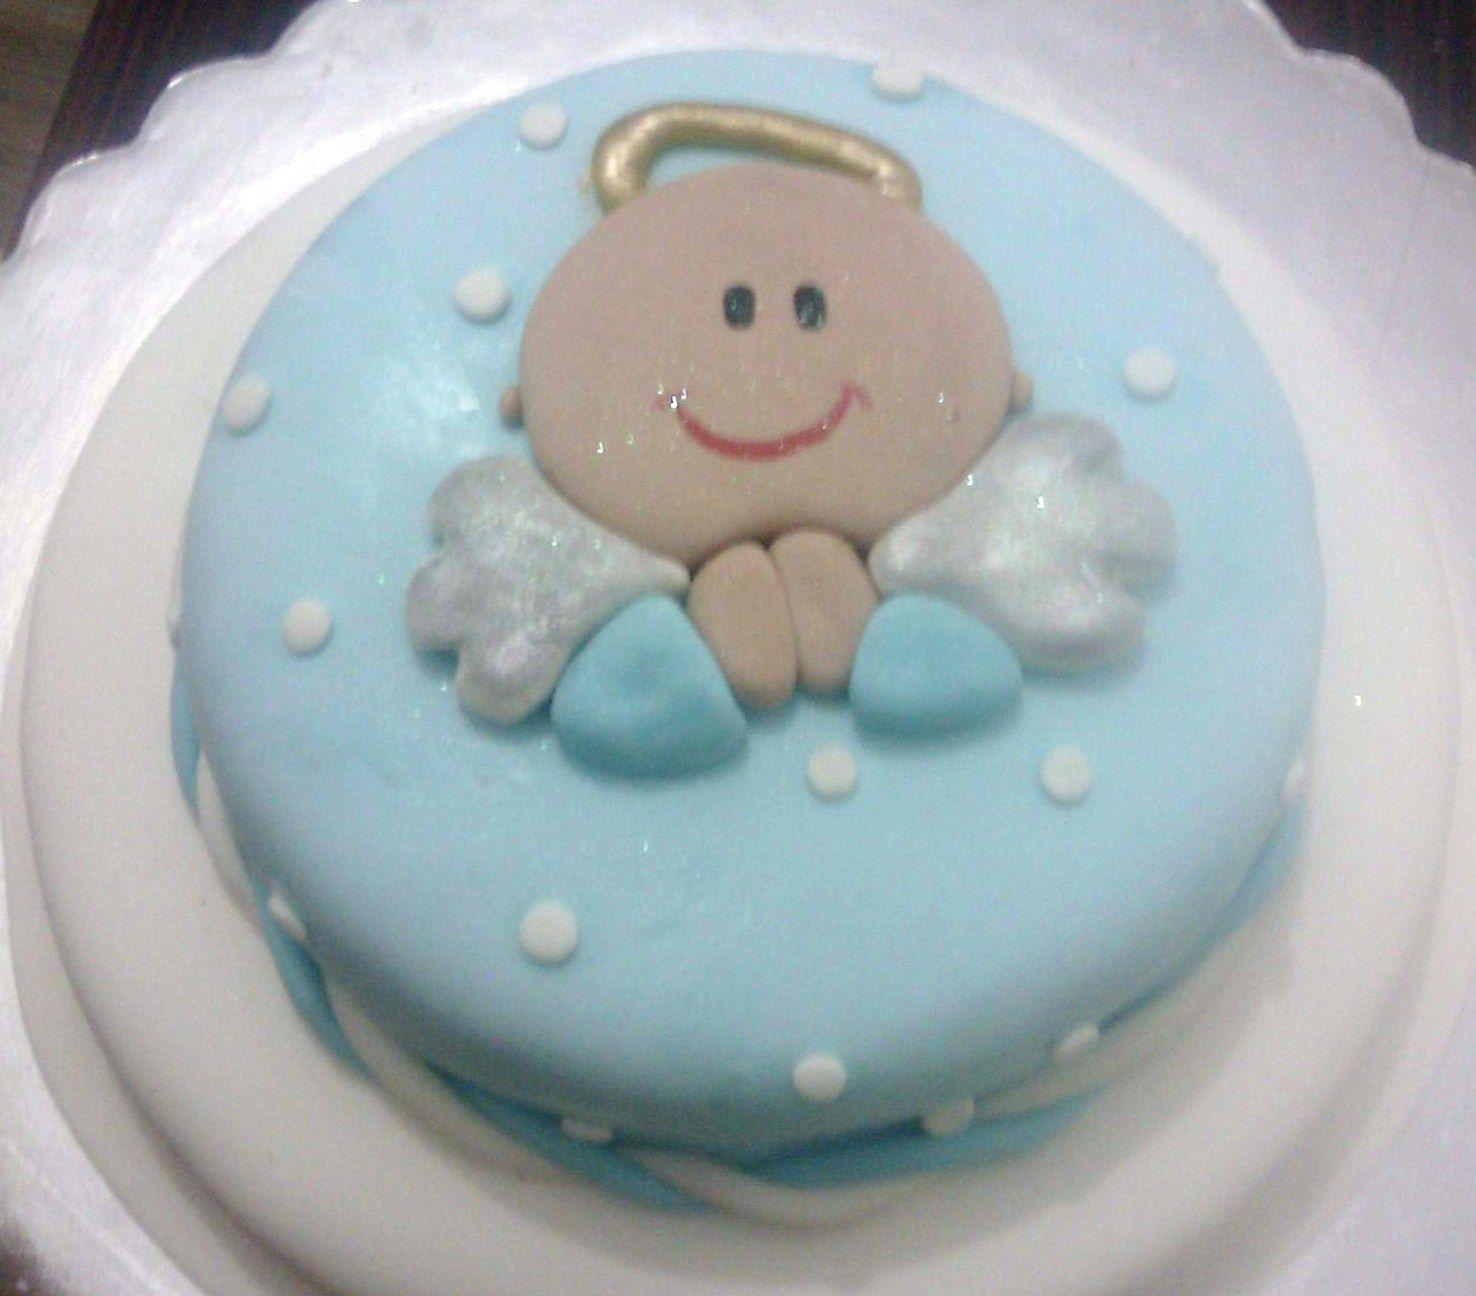 Torta para Bautizo | Torta bautizo, Torta bautismo nena